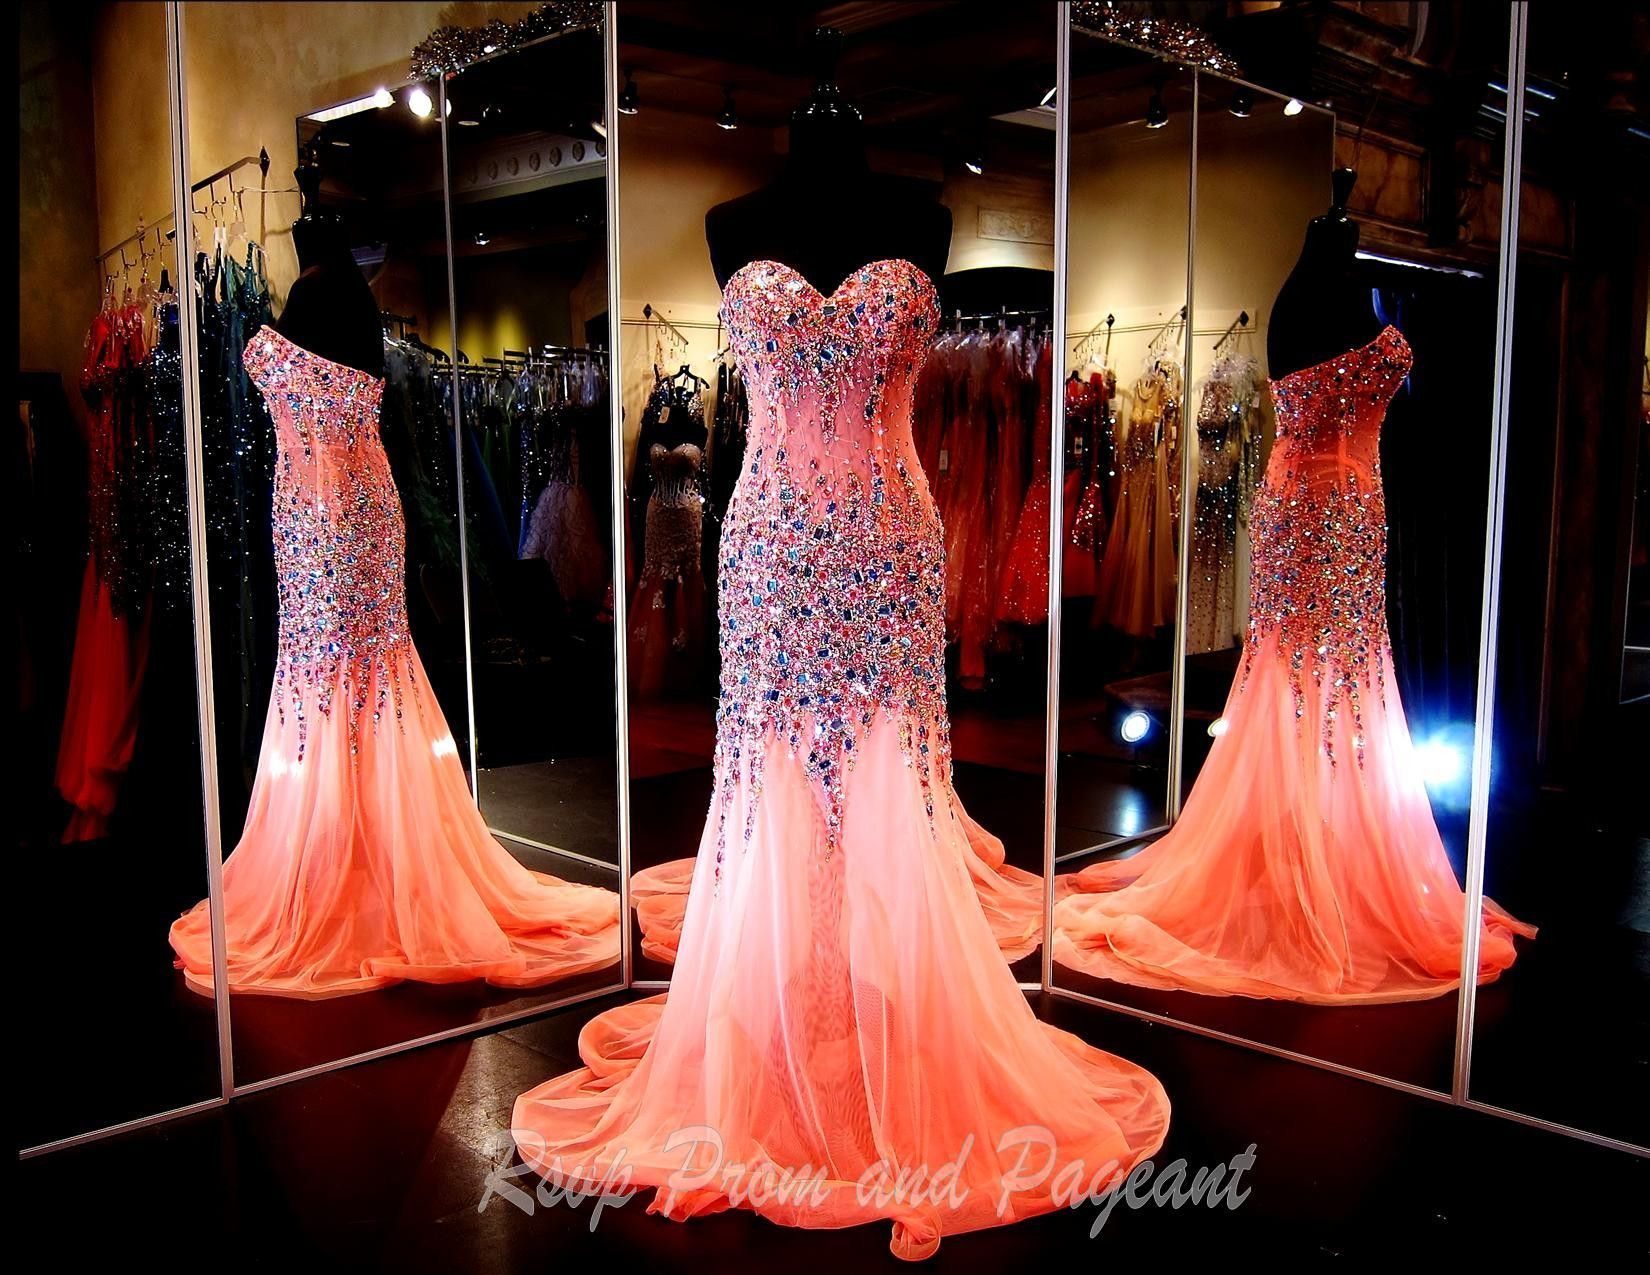 Jc coral prom store atlanta prom store lawrenceville